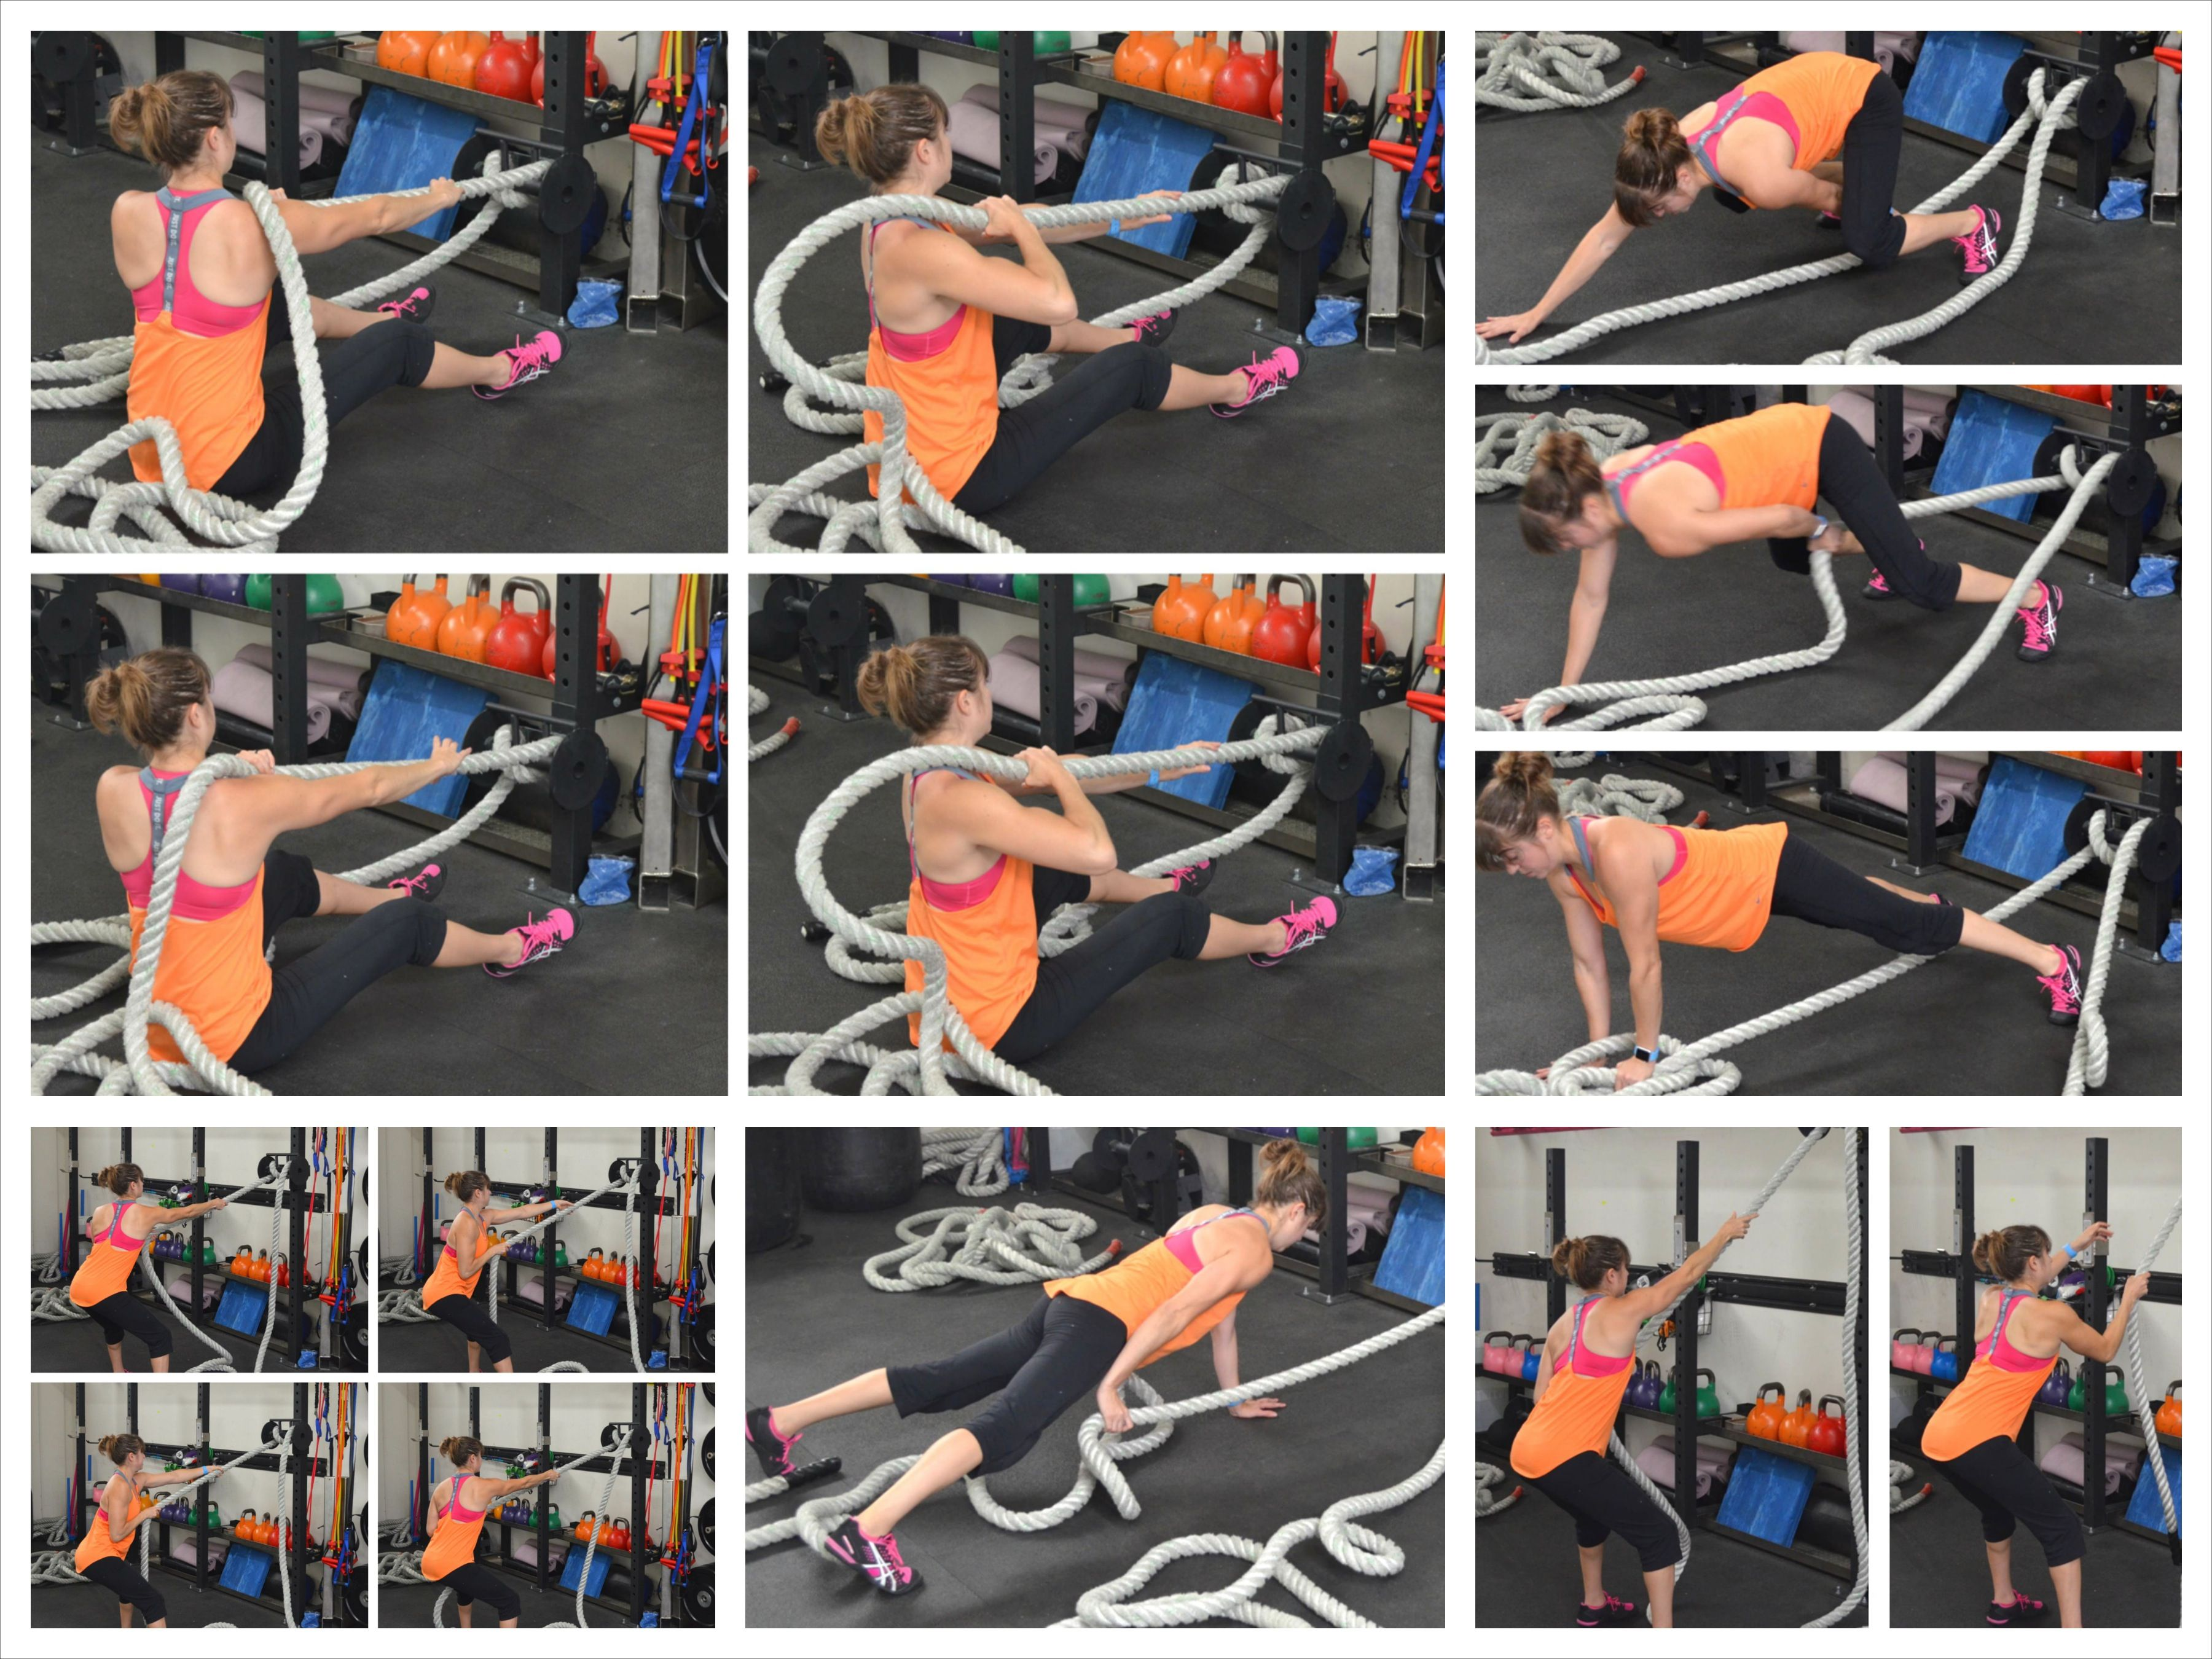 Battle ropes pulls battle rope workout battle ropes